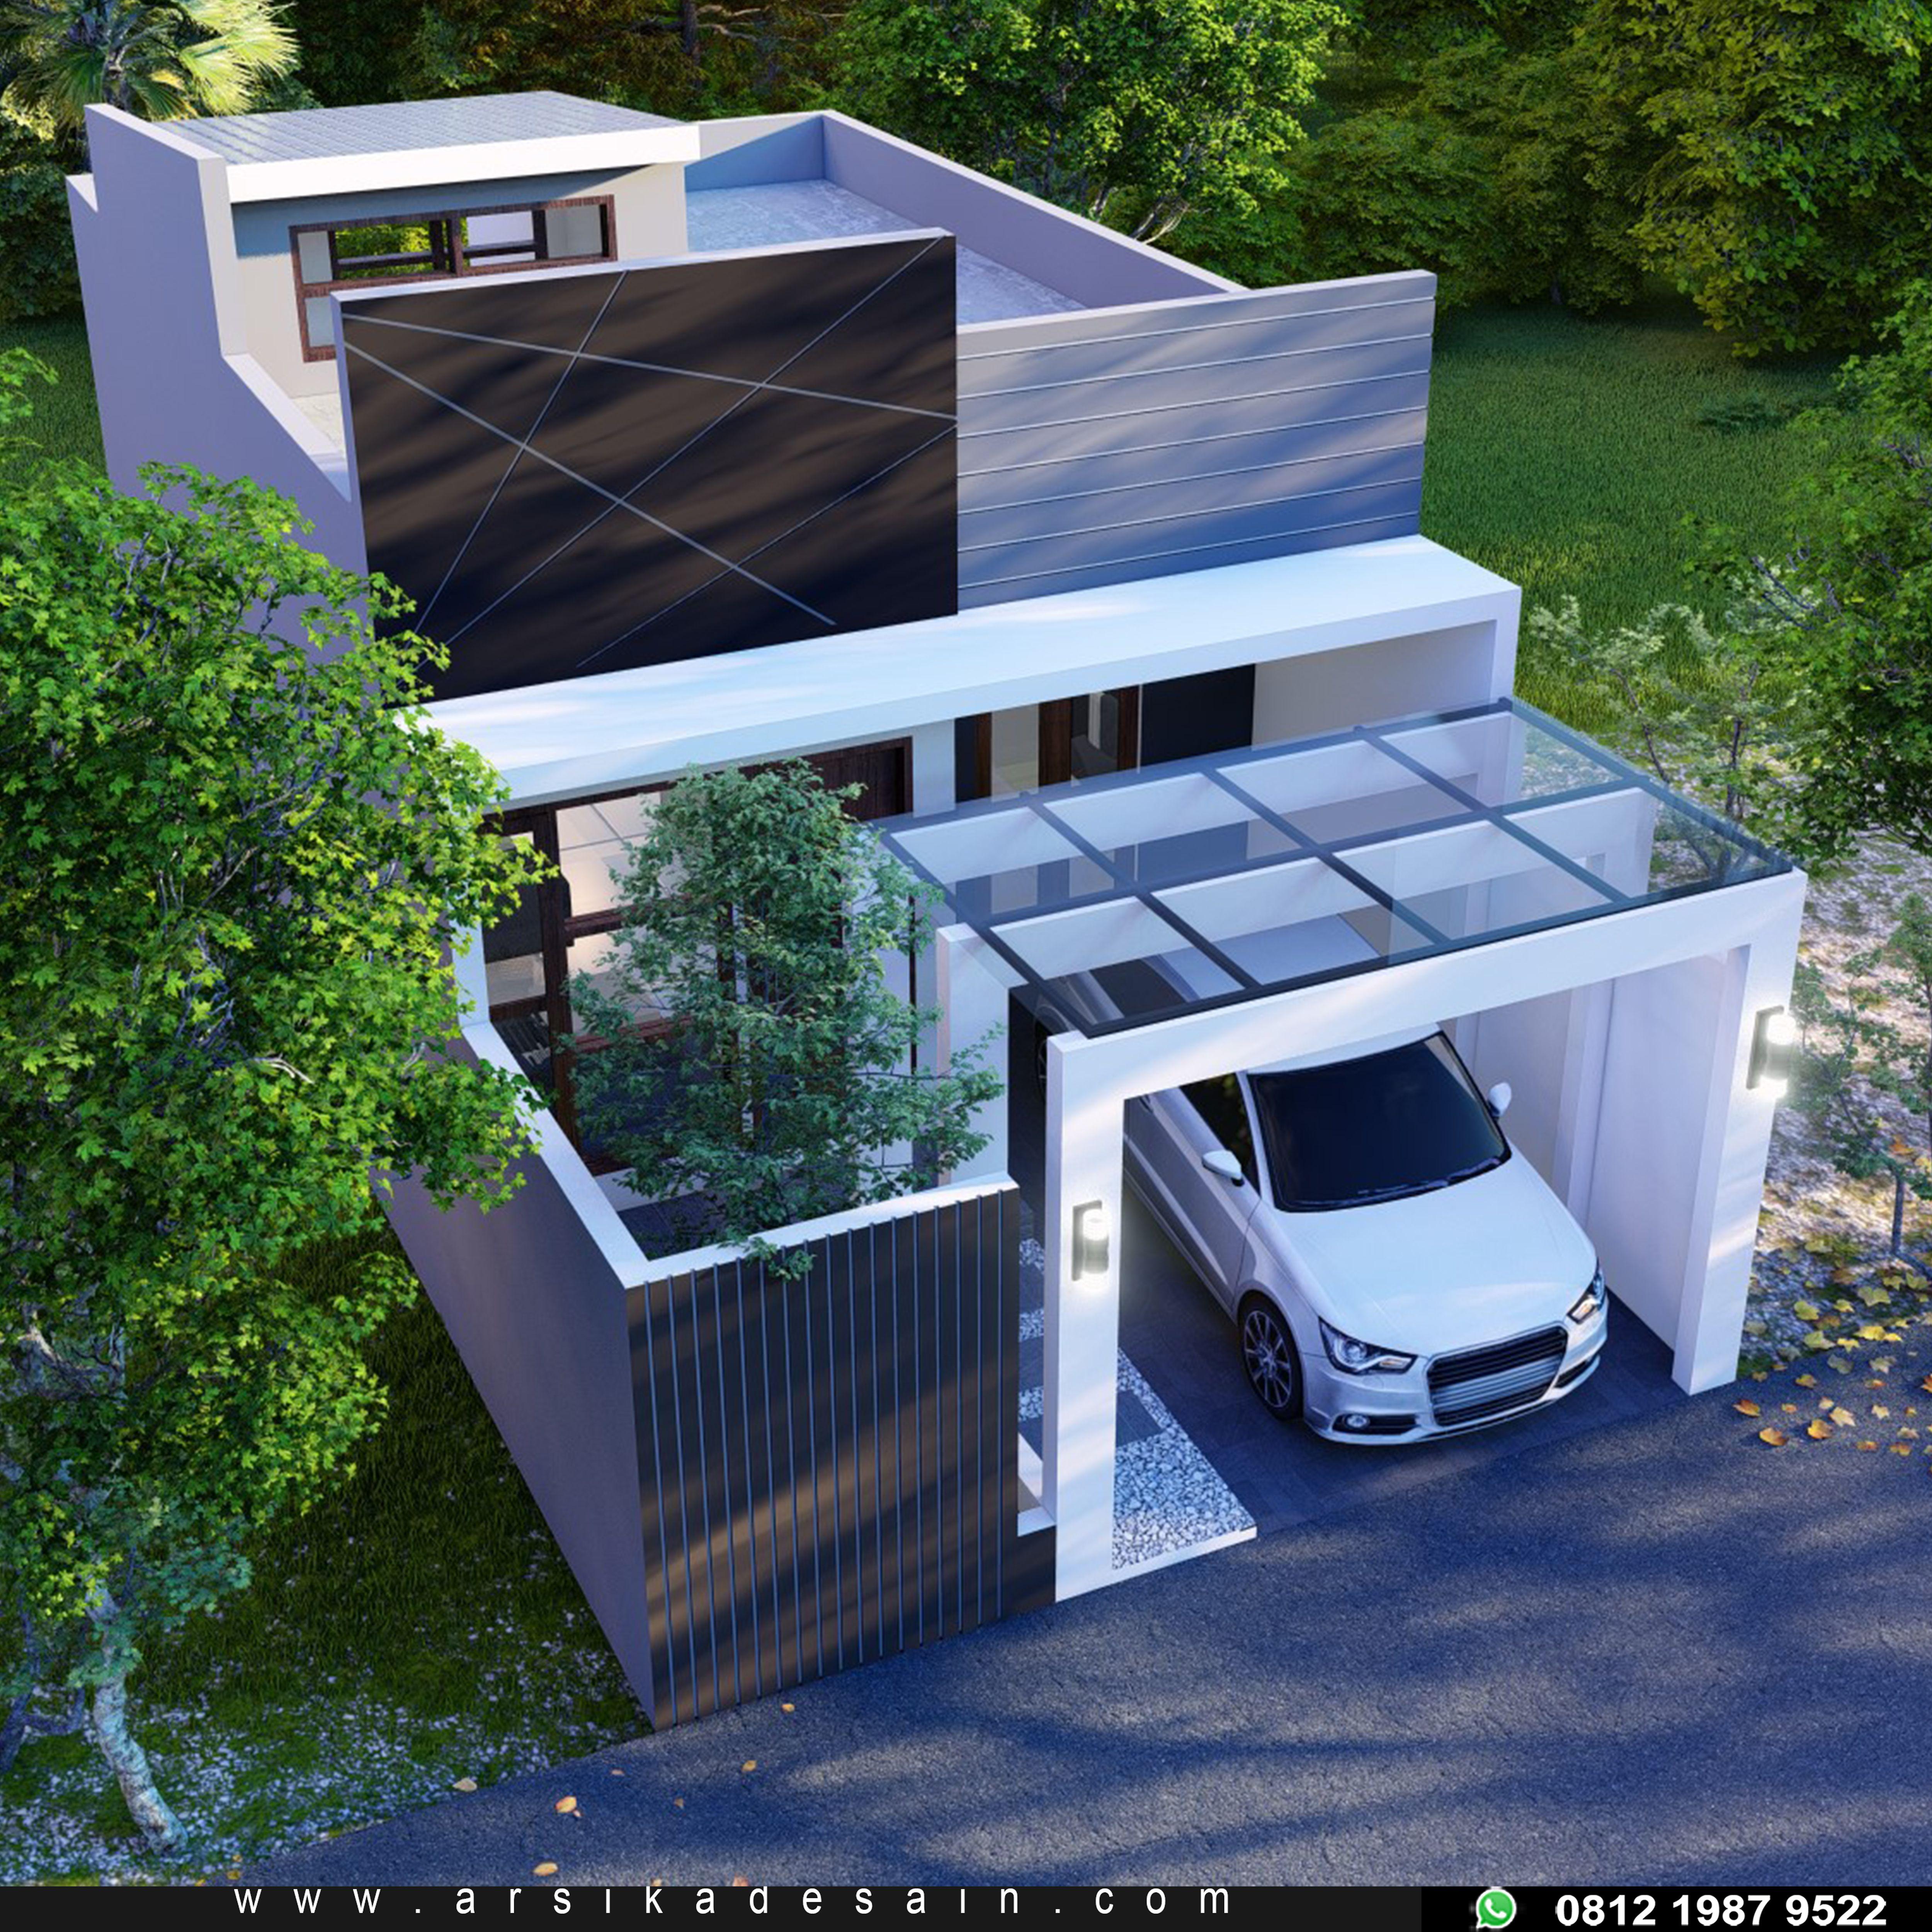 Desain Rumah Atap Datar Flat Rumah Arsitektur Arsitektur Modern